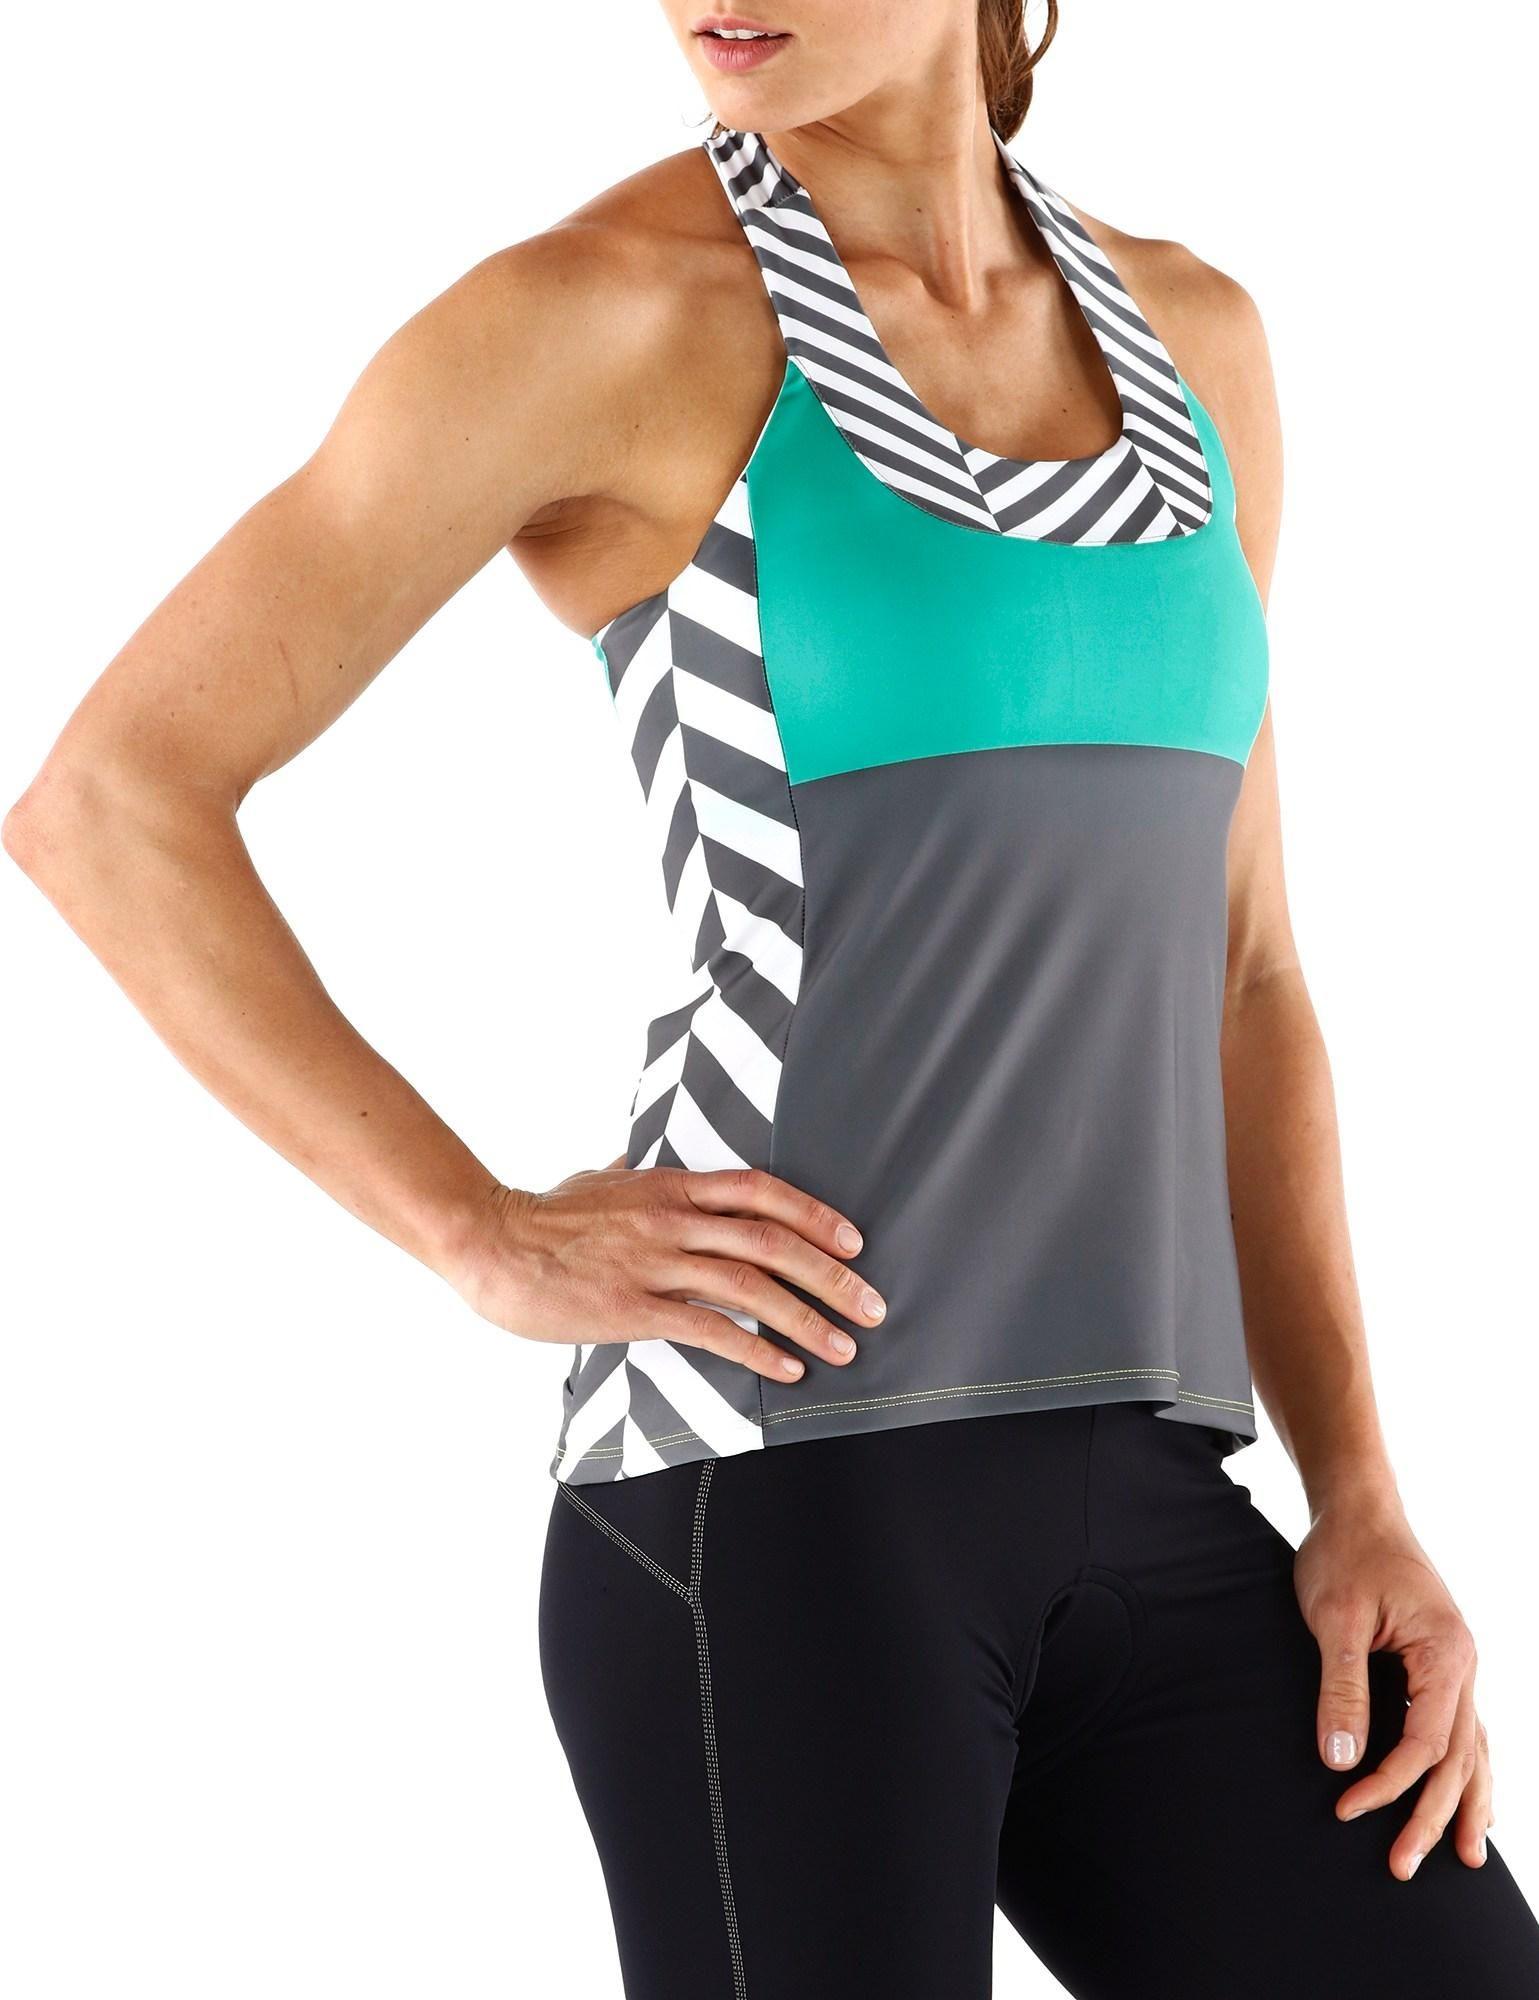 Moxie Cycling T Back Bike Jersey Women S Cycling Outfit